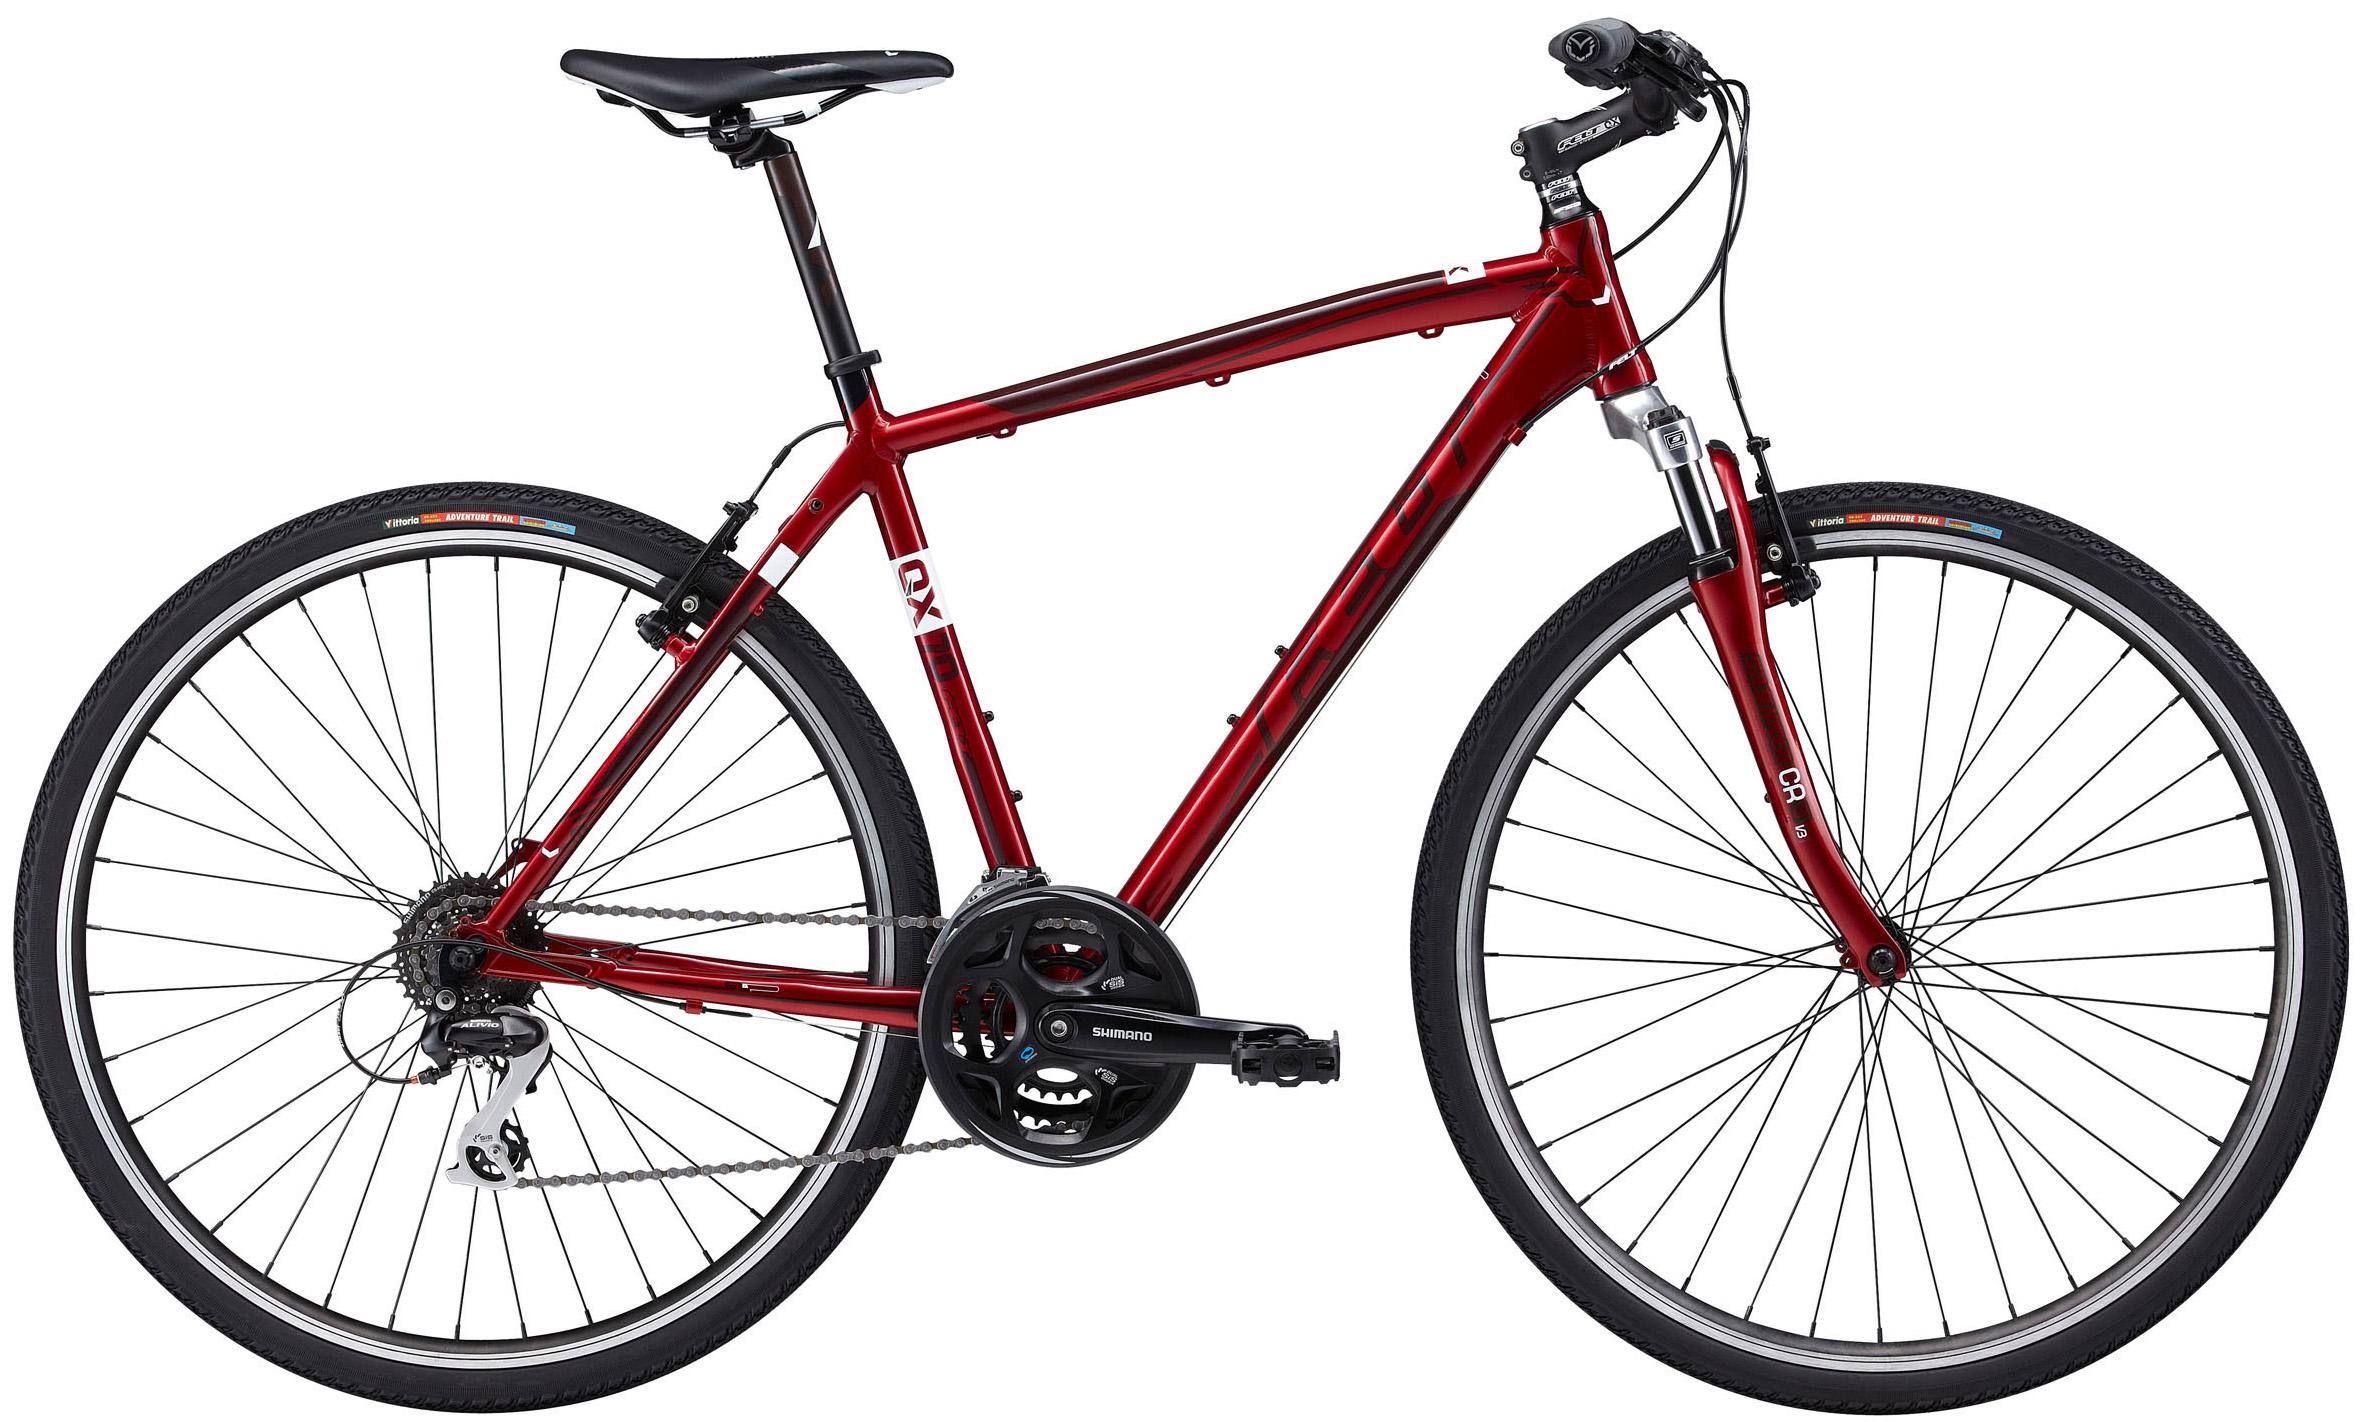 "Pánské trekové kolo Felt QX70 2012 + cyklocomputer BCP-06 za 559 Kč zdarma červená, 19"", 48 cm"